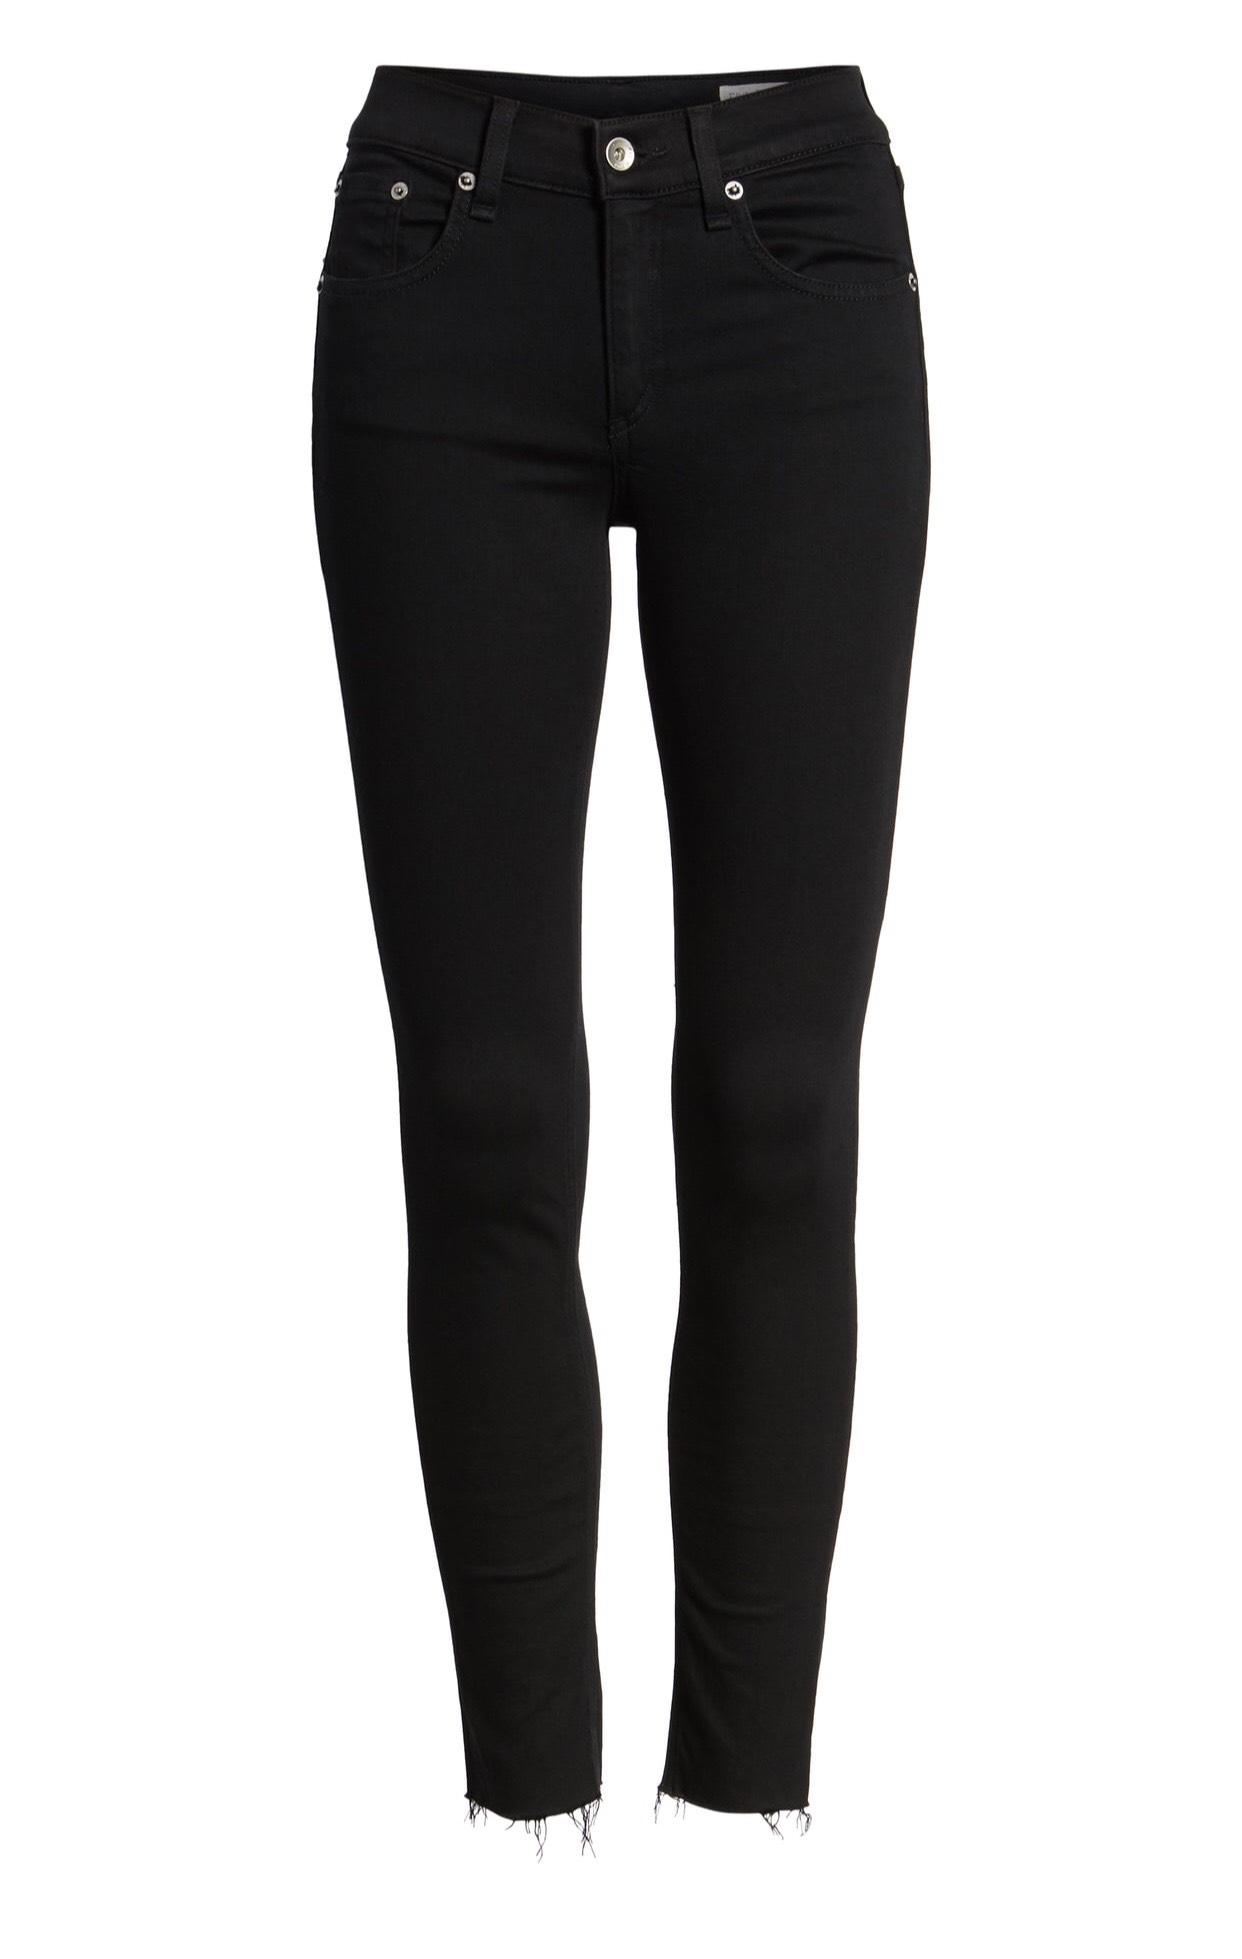 rag & bone Raw Hem Ankle Skinny Jeans {$129.90} - After sale: $195